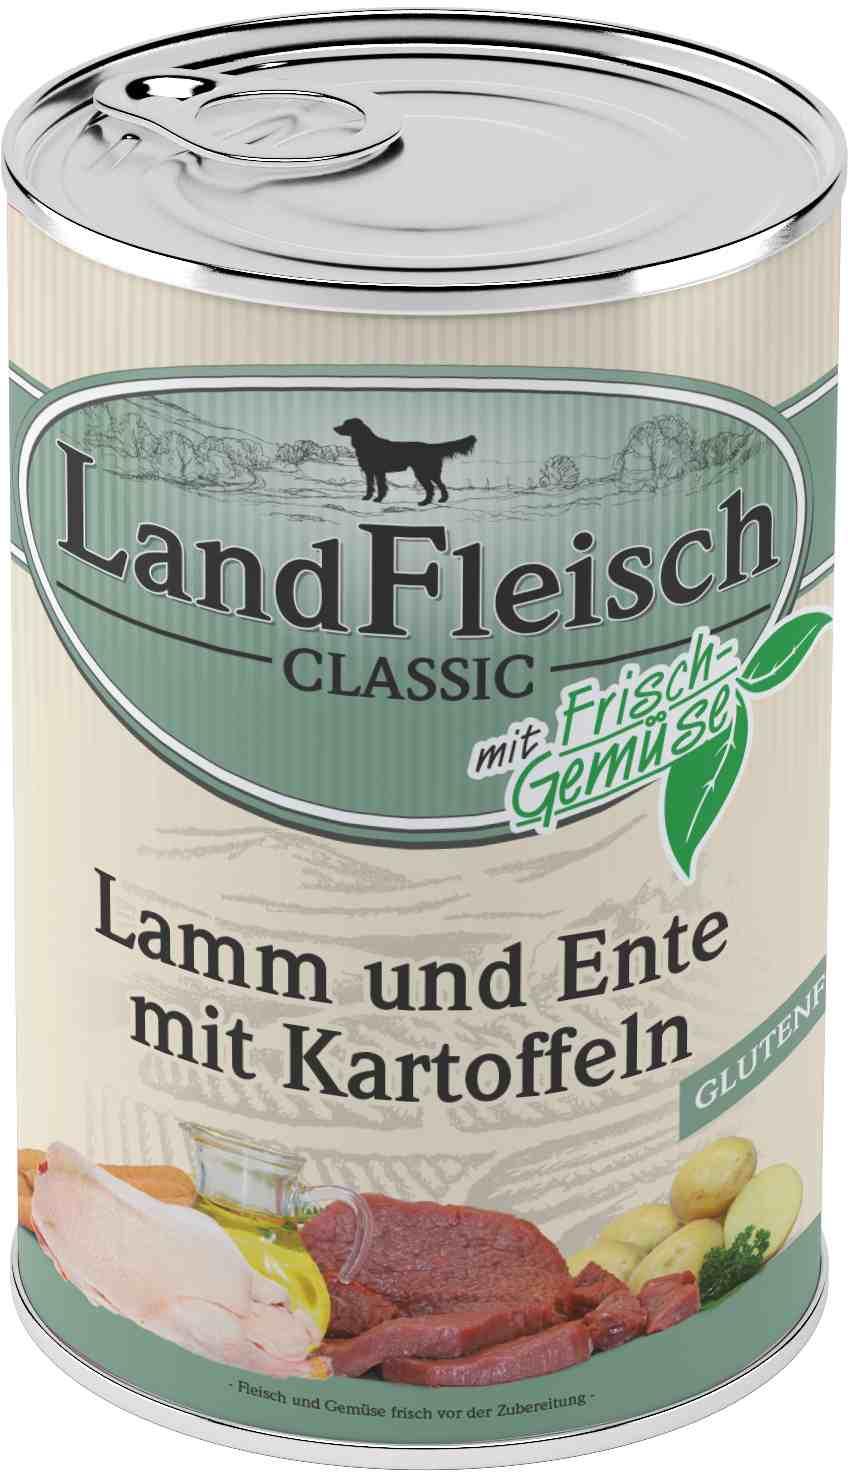 Landfleisch Dog Classic Lamm, Ente, Kart. 400g